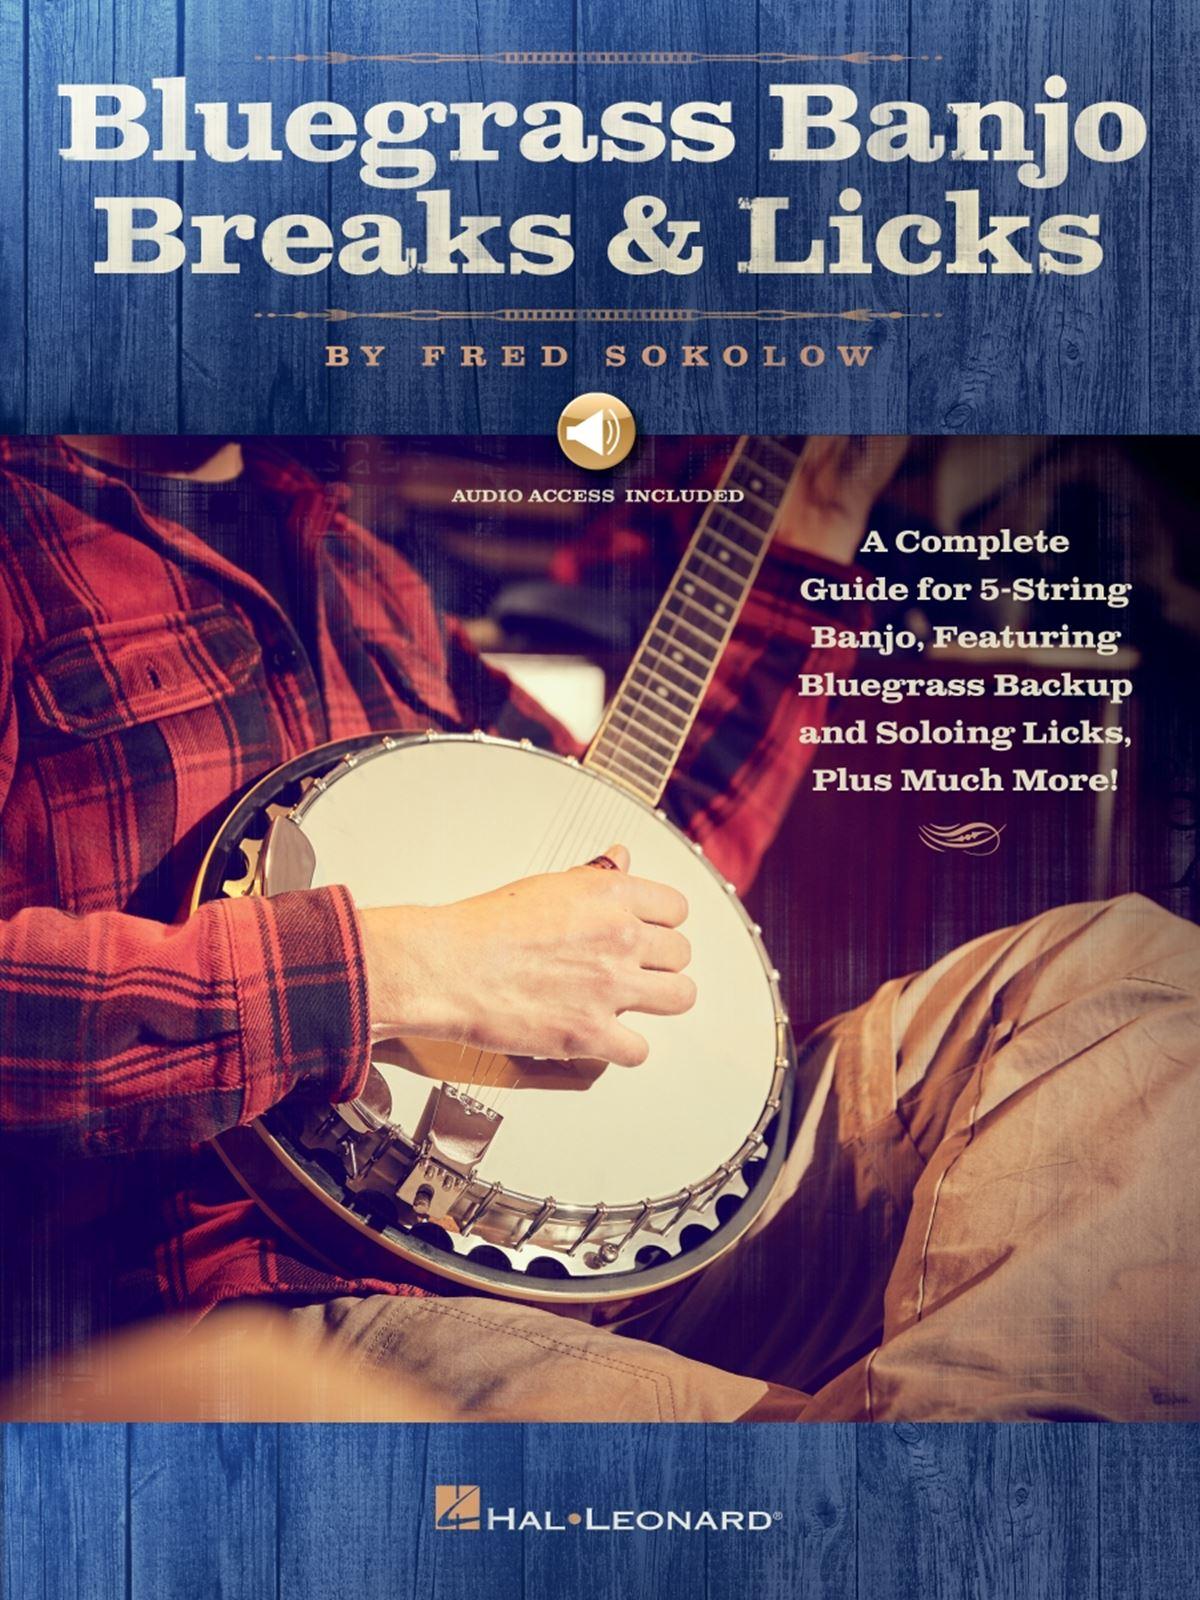 Bluegrass Banjo Breaks and Licks